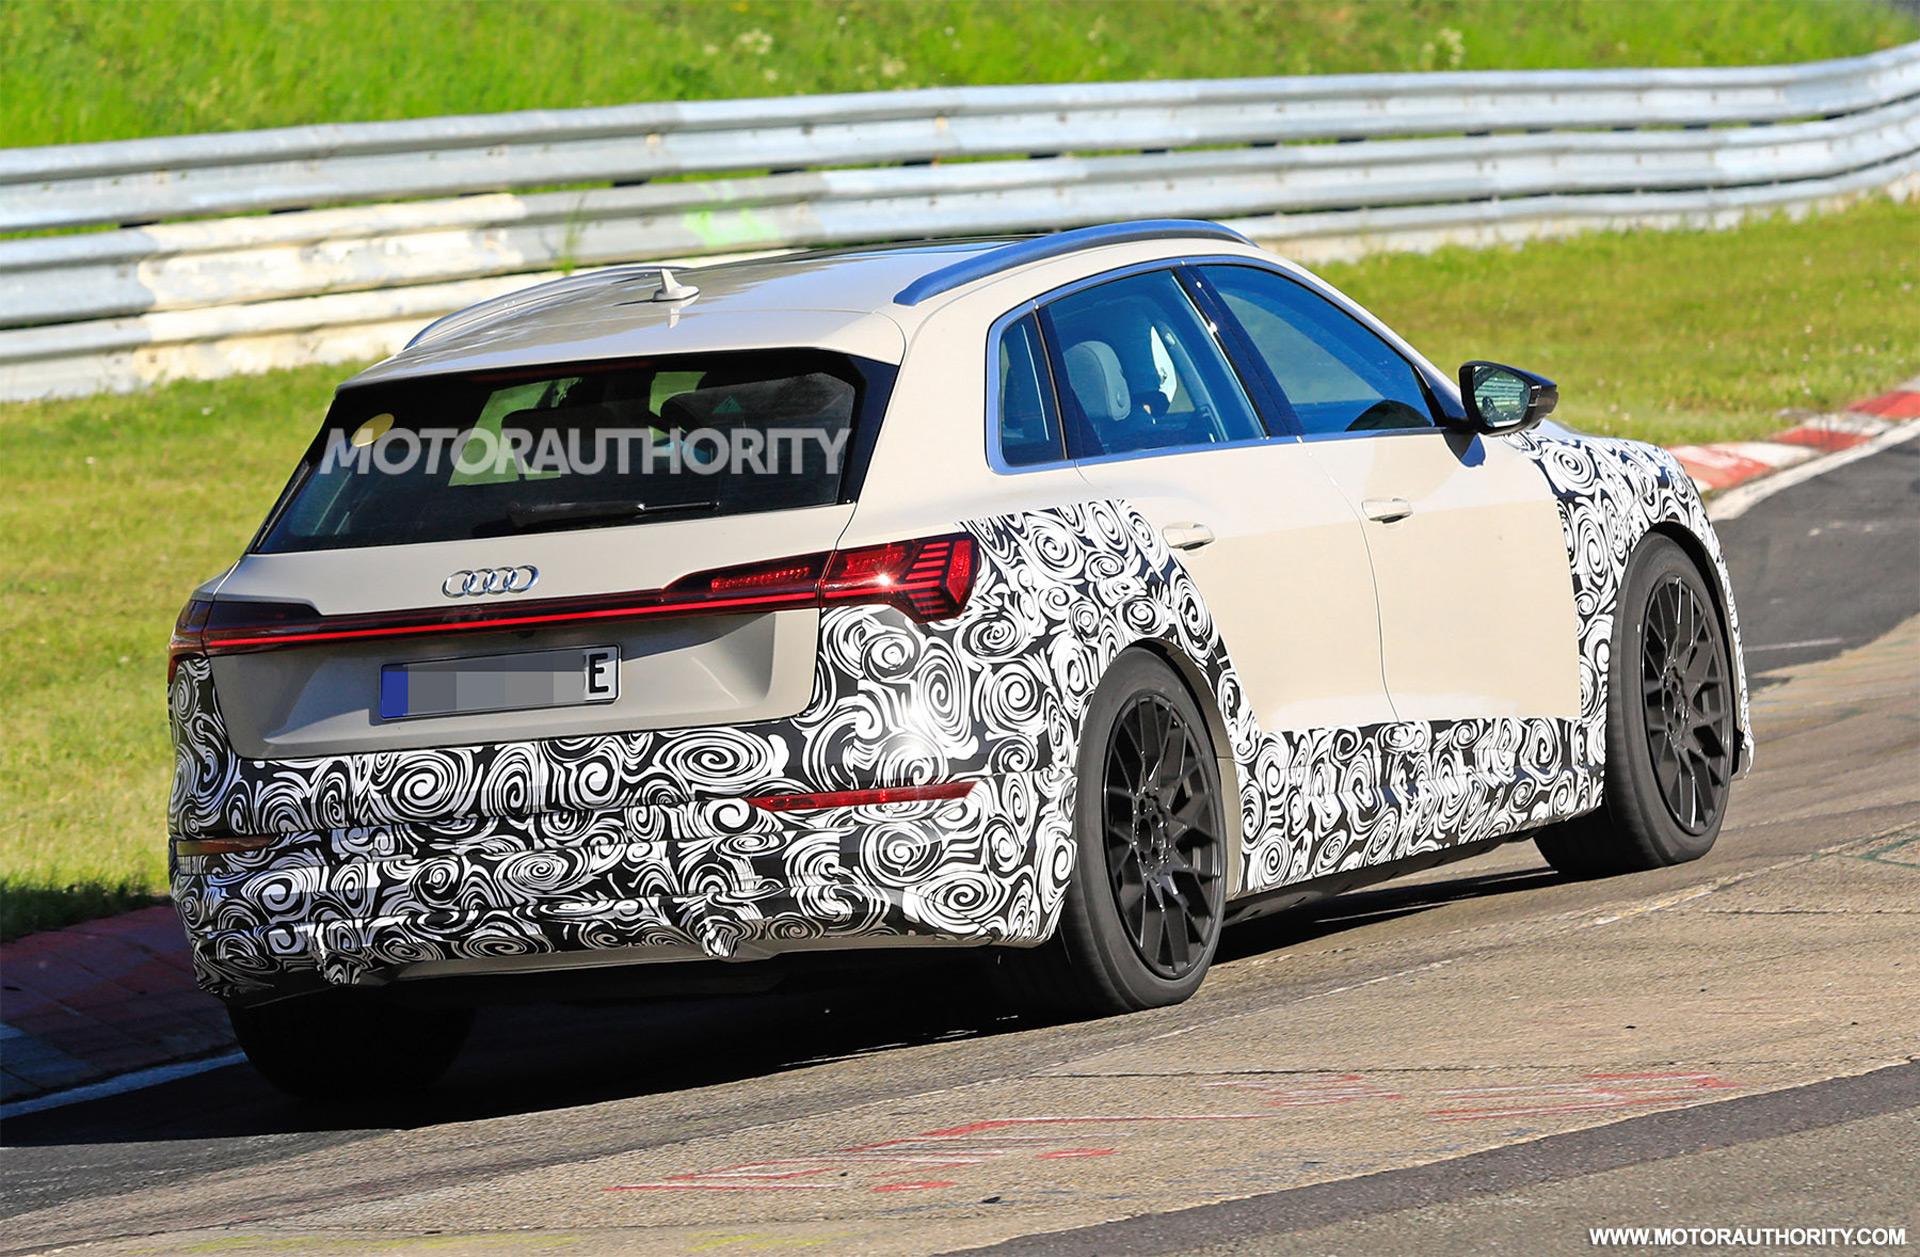 2018 [Audi] E-Tron Quattro - Page 7 2020-audi-e-tron-s-spy-shots--image-via-s-baldauf-sb-medien_100702359_h